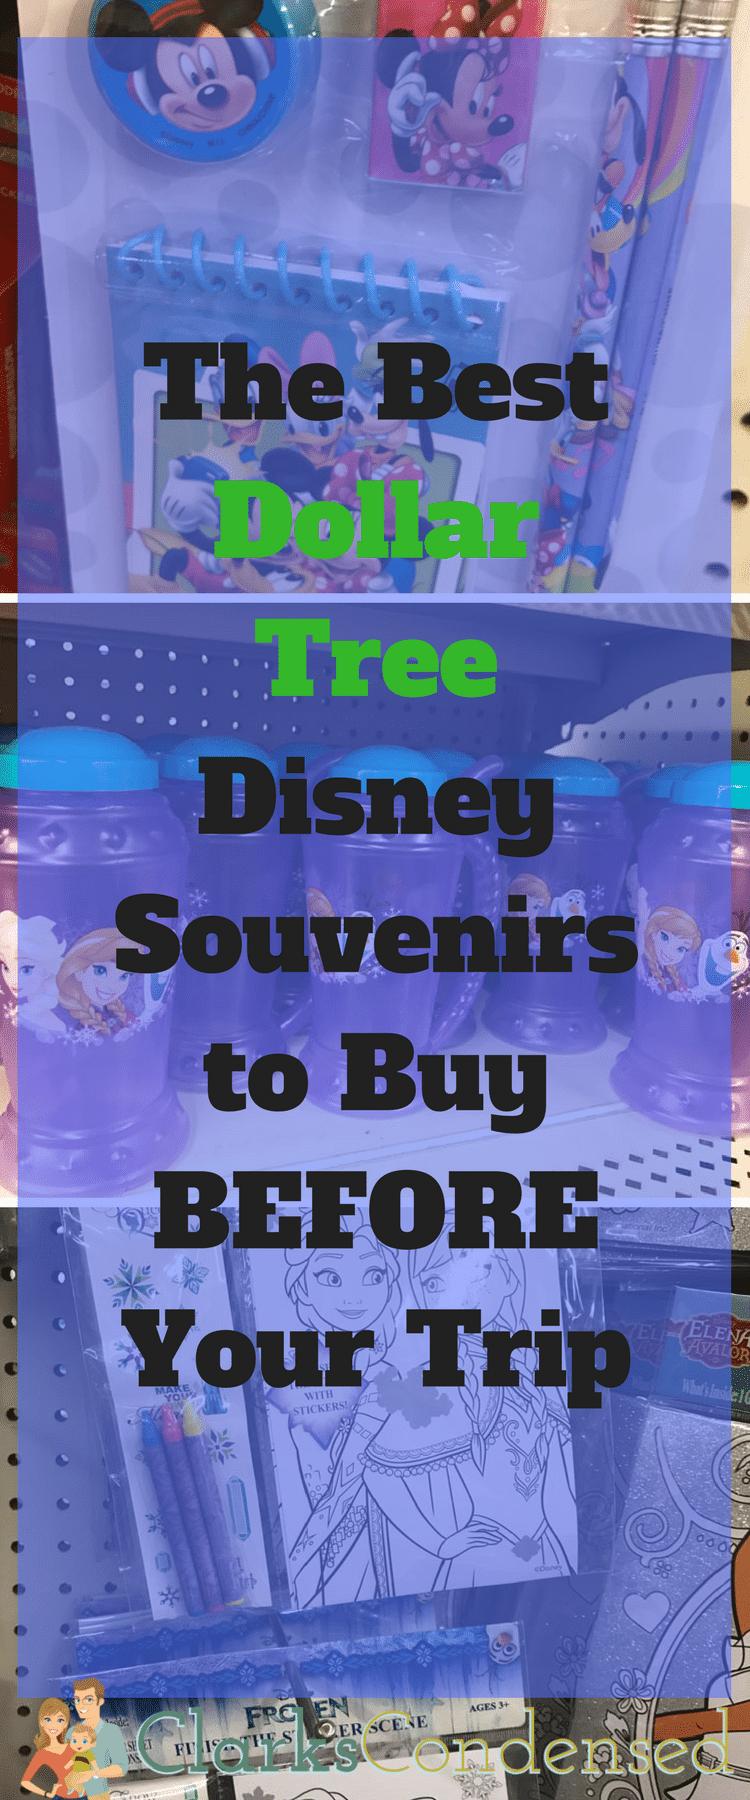 Dollar Tree / Dollar Tree Disney / Disneyland / Disney Souvenirs / Dollar Tree Products via @clarkscondensed